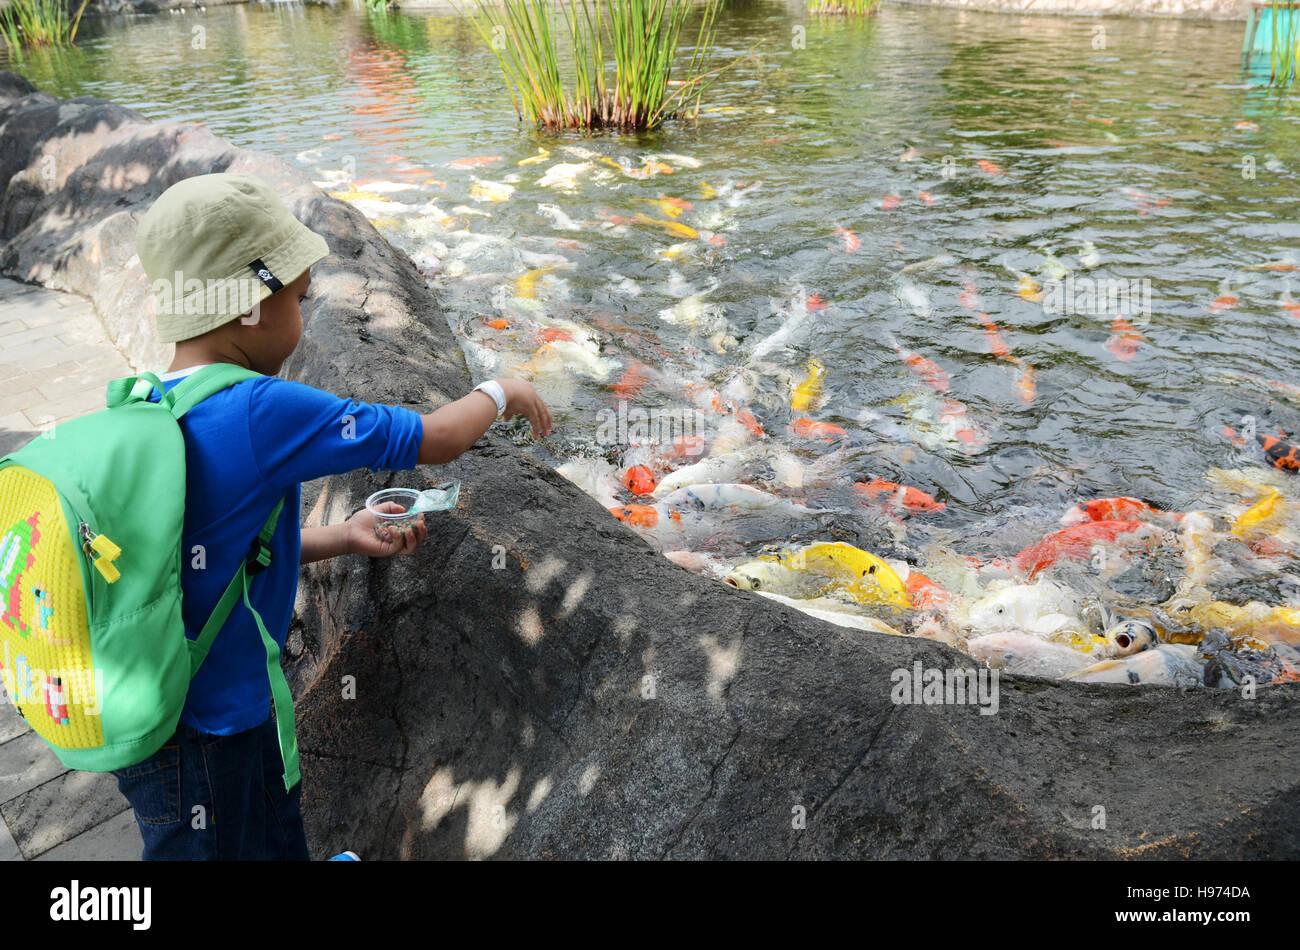 Kid Feeding Fish At Batu Zoo Malang East Java Indonesia Stock Photo Alamy